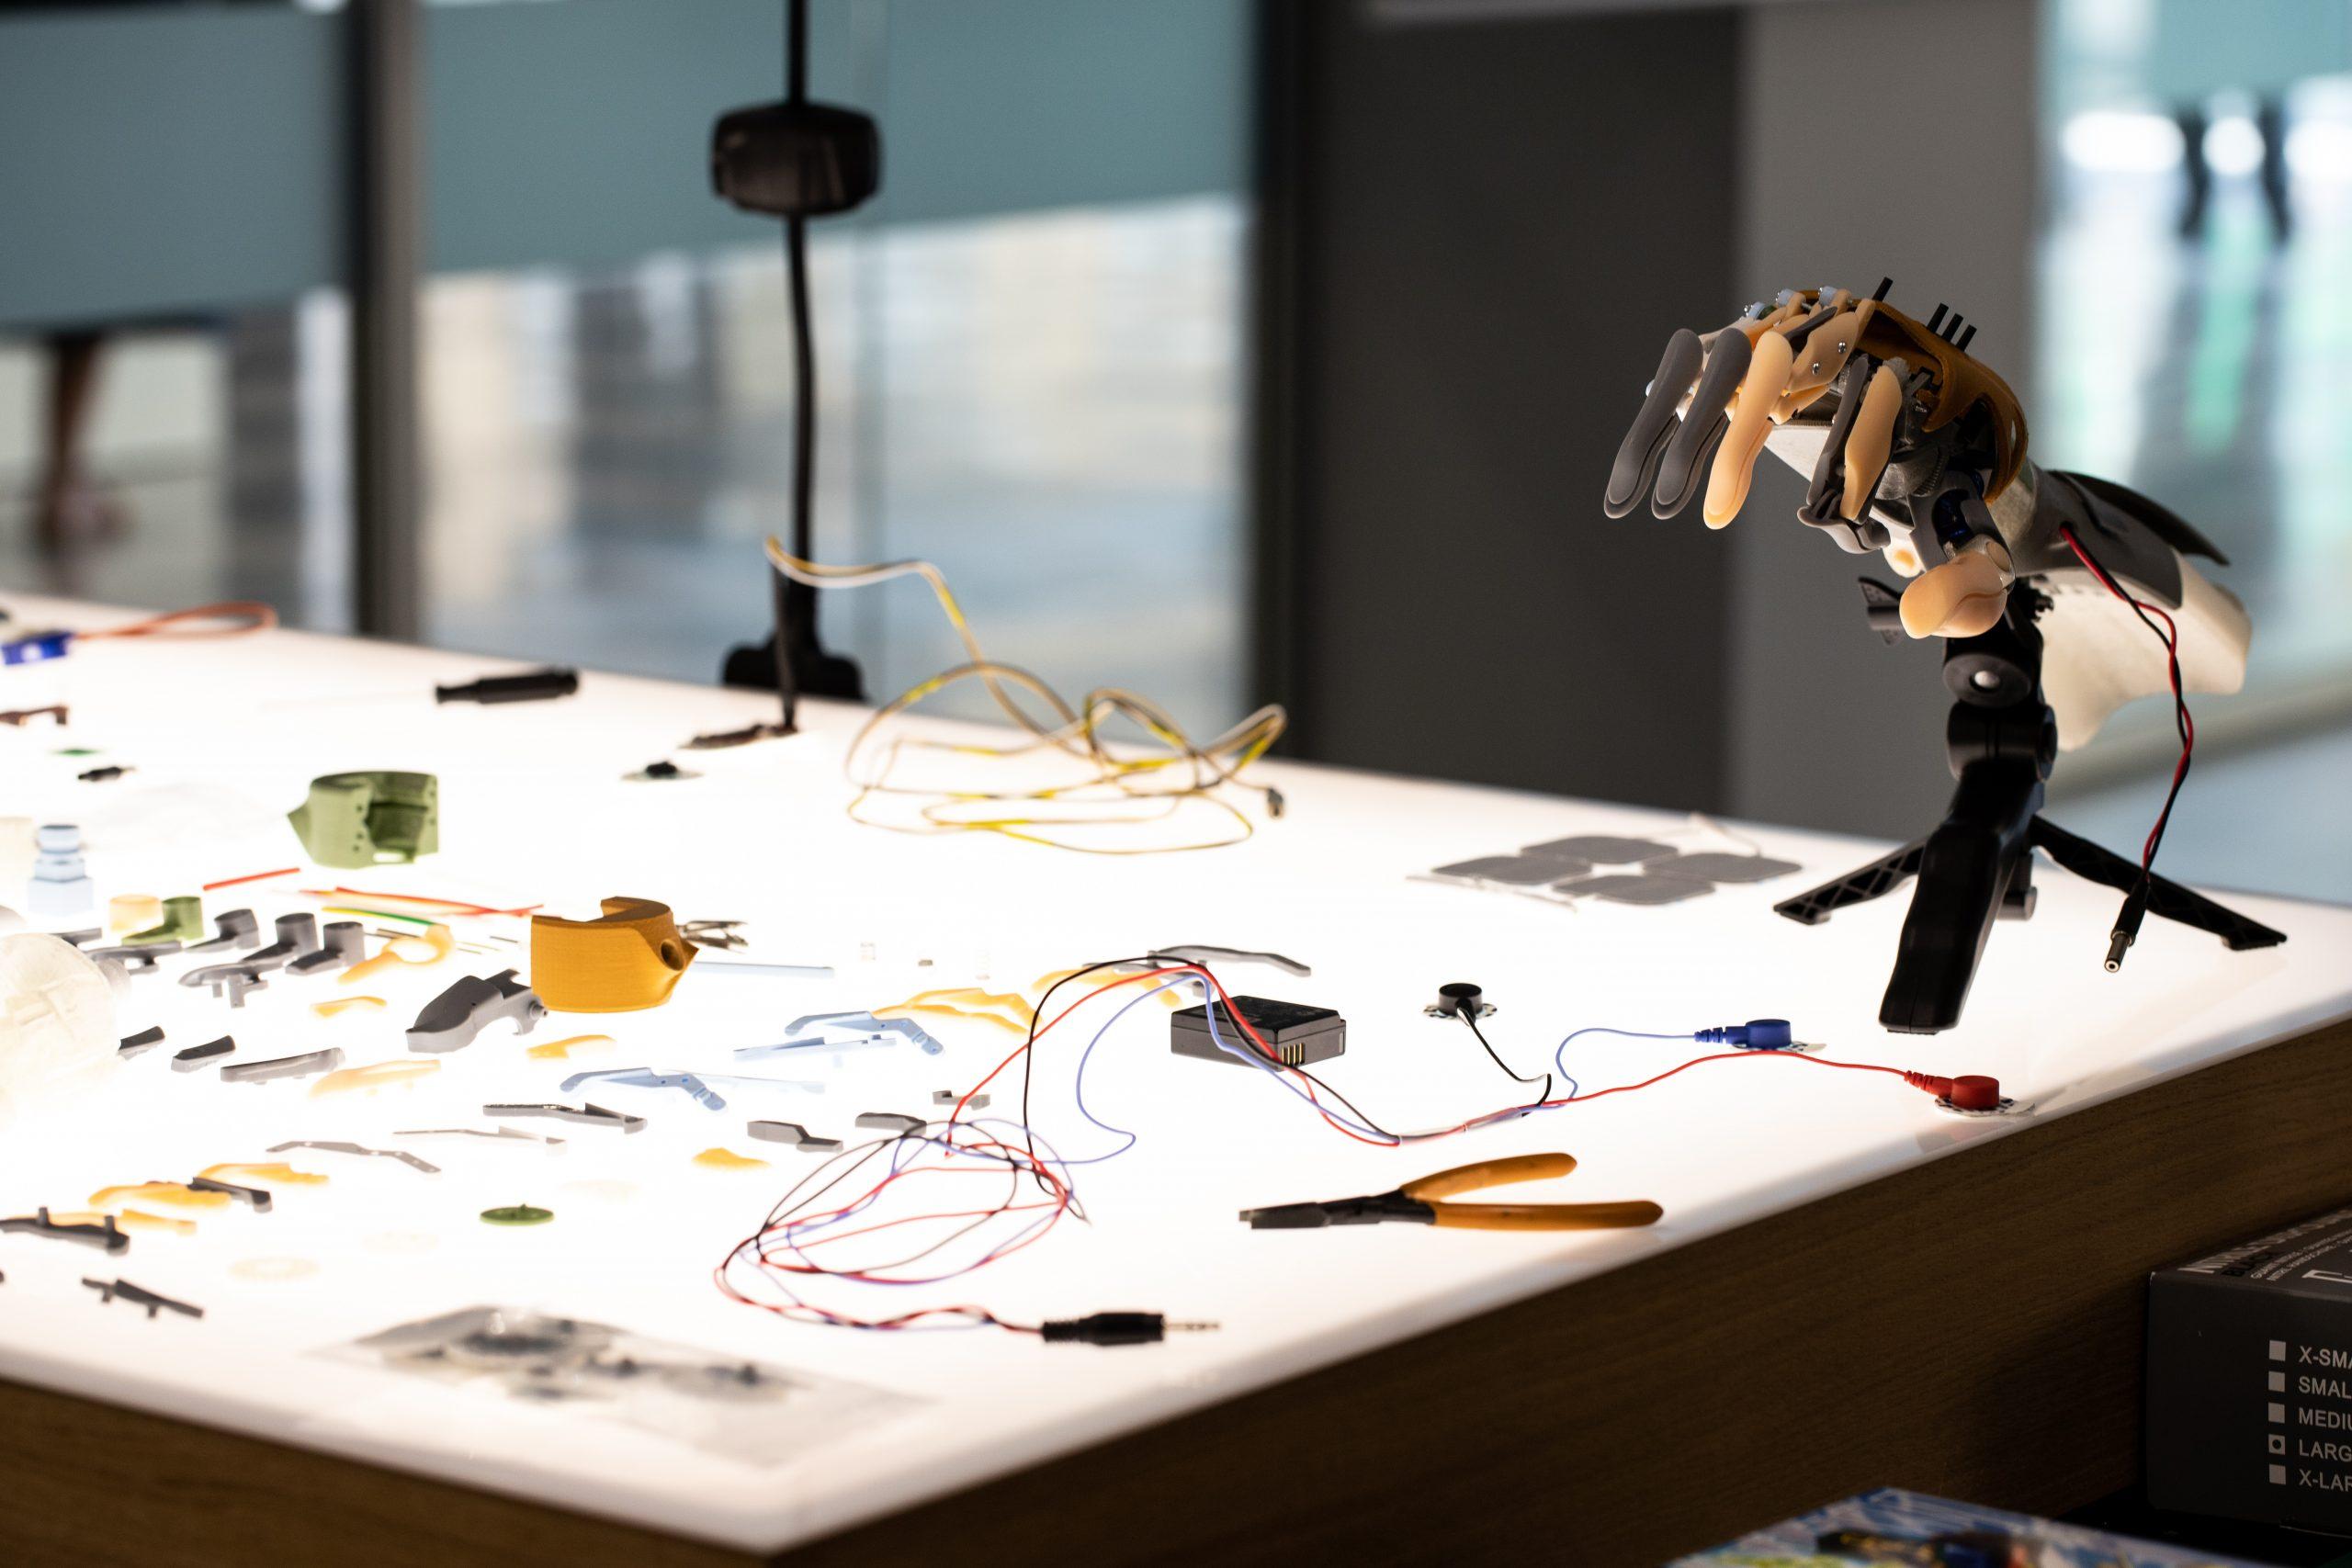 design futures, cyens thinker maker space